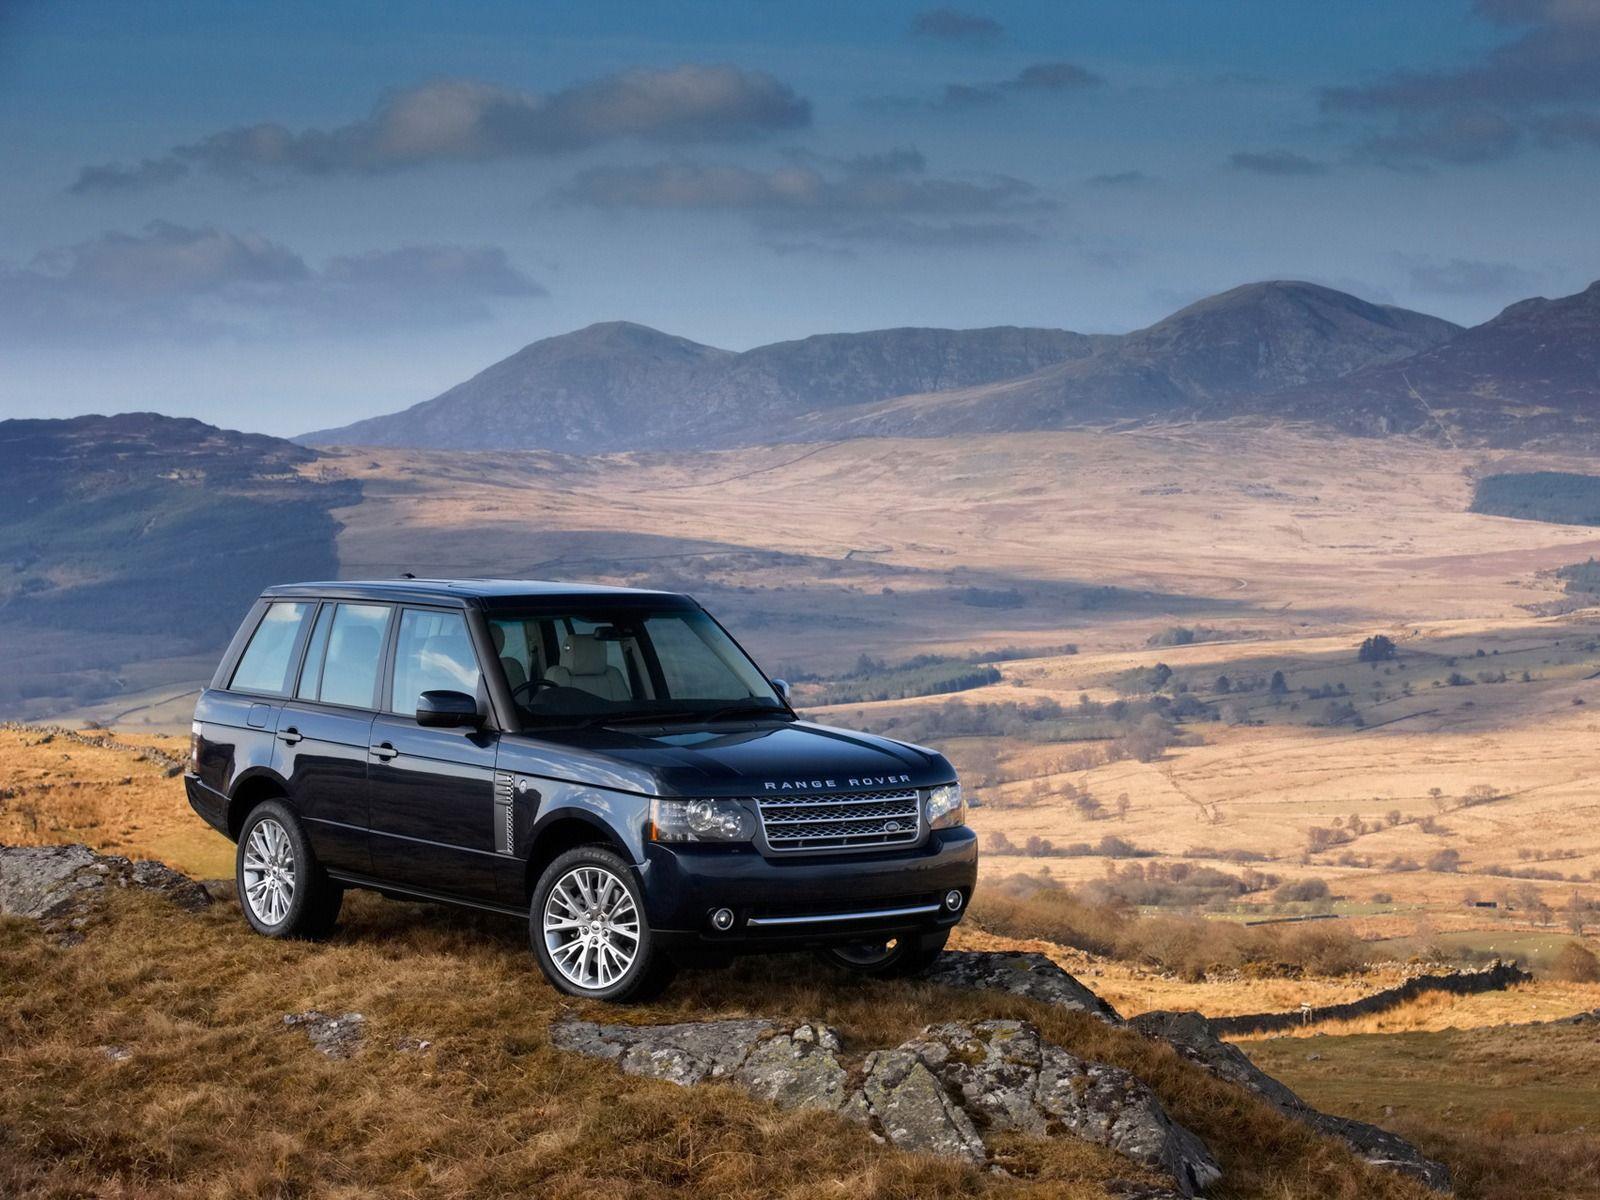 Black Range Rover Sport Wallpaper: Range Rover Sport 2017 Desktop Wallpapers 1600x1200